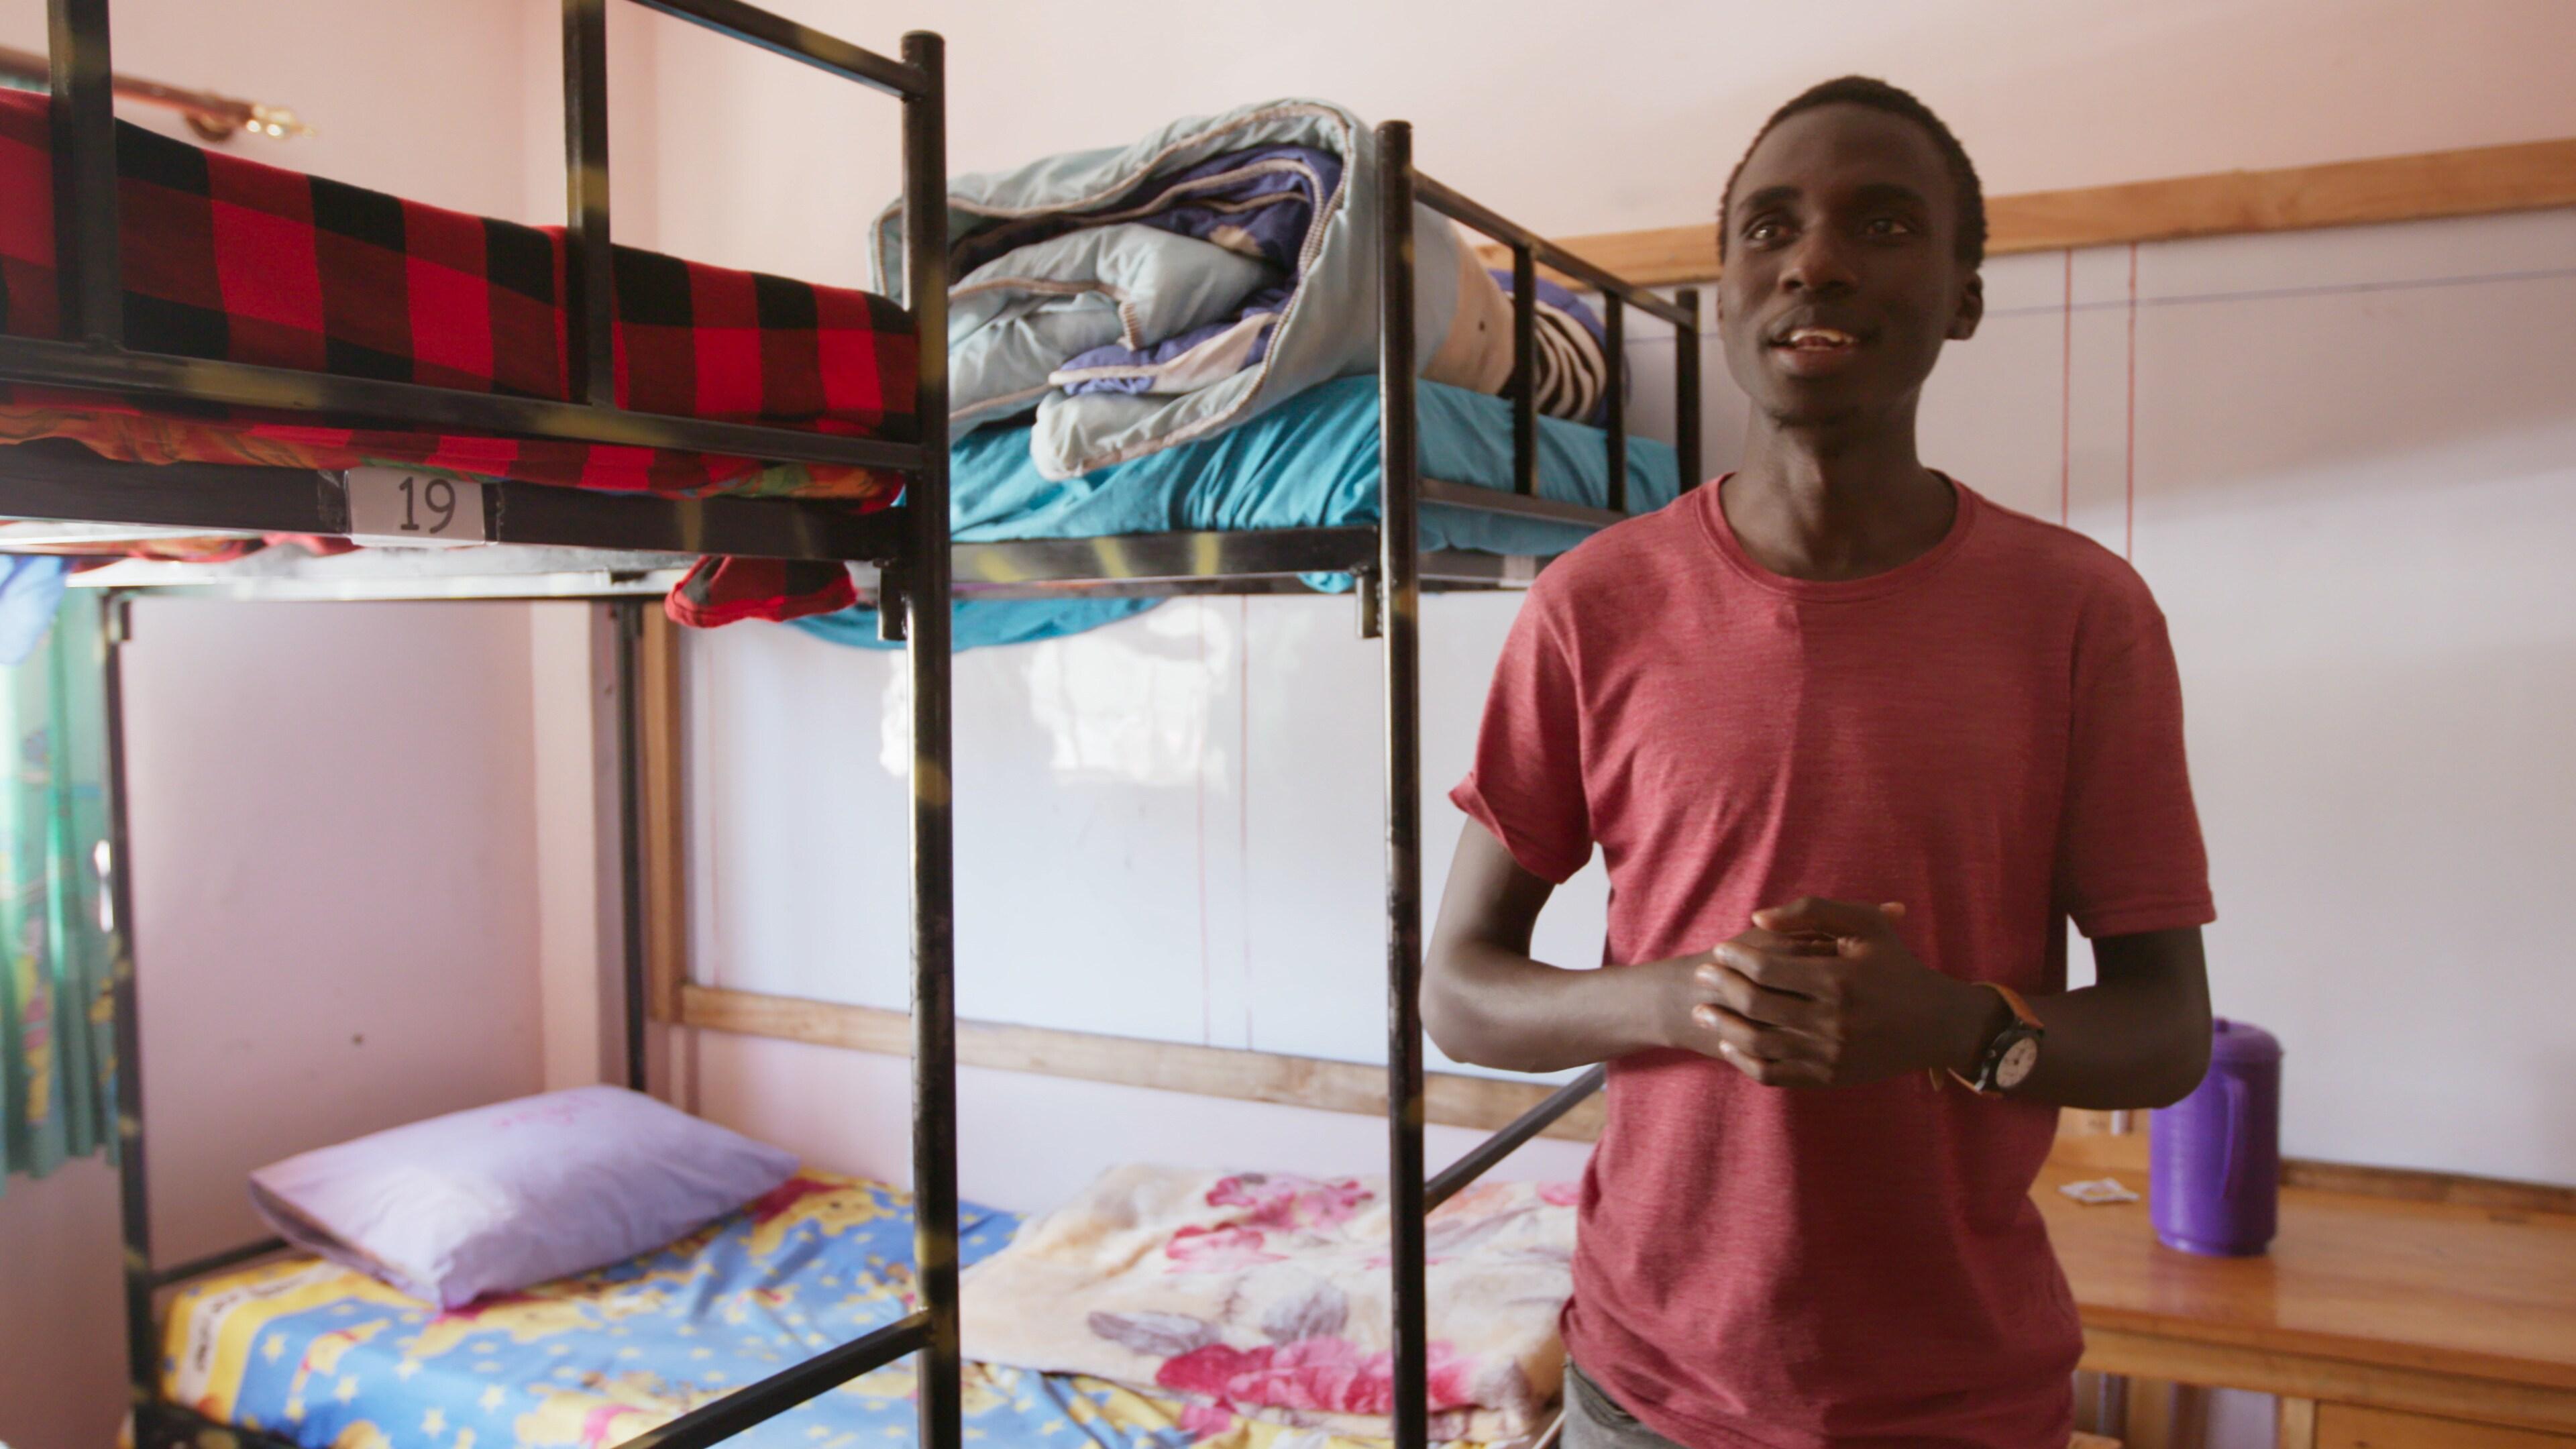 Nairobi, Kenya - Henry Onyango, founder of Roometo, gives a tour of university accommodations. (Credit: Future of Work Film Inc)